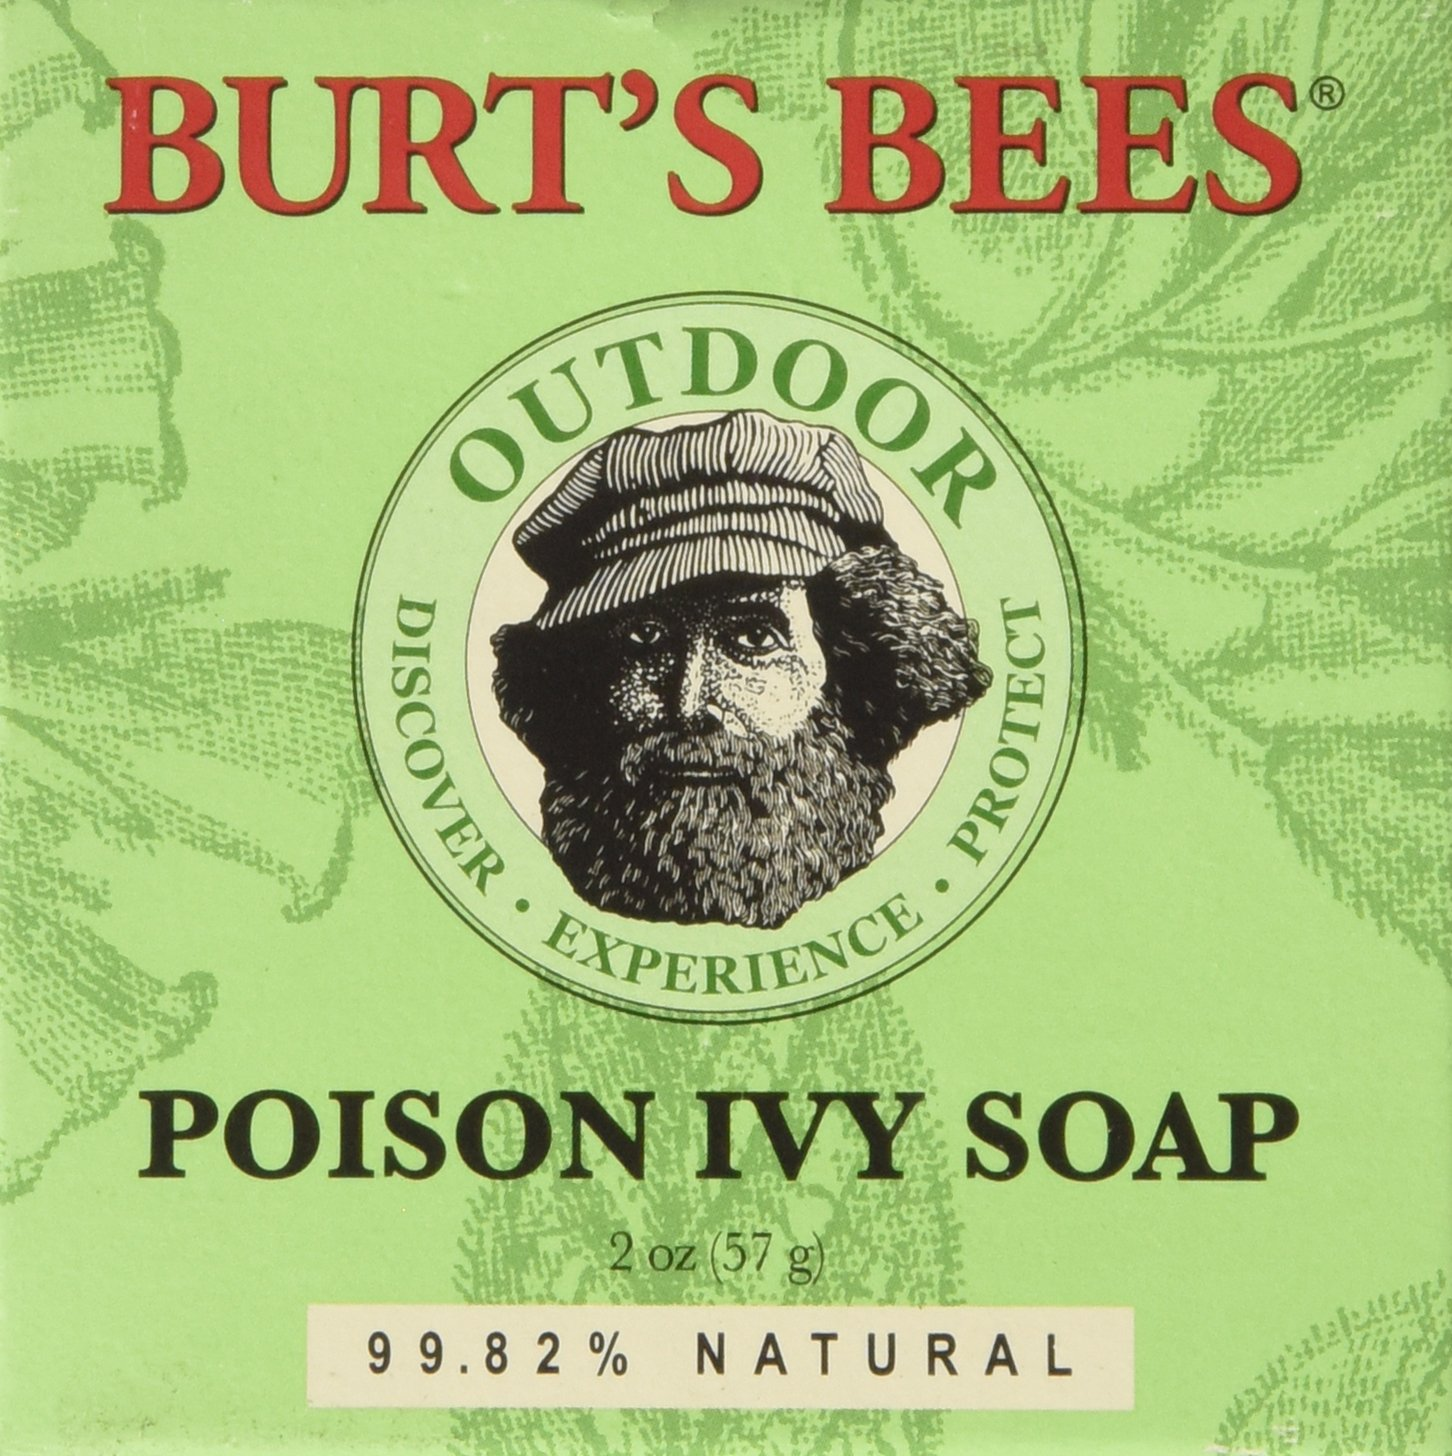 Burt's Bees Poison Ivy Soap, 2-Ounce